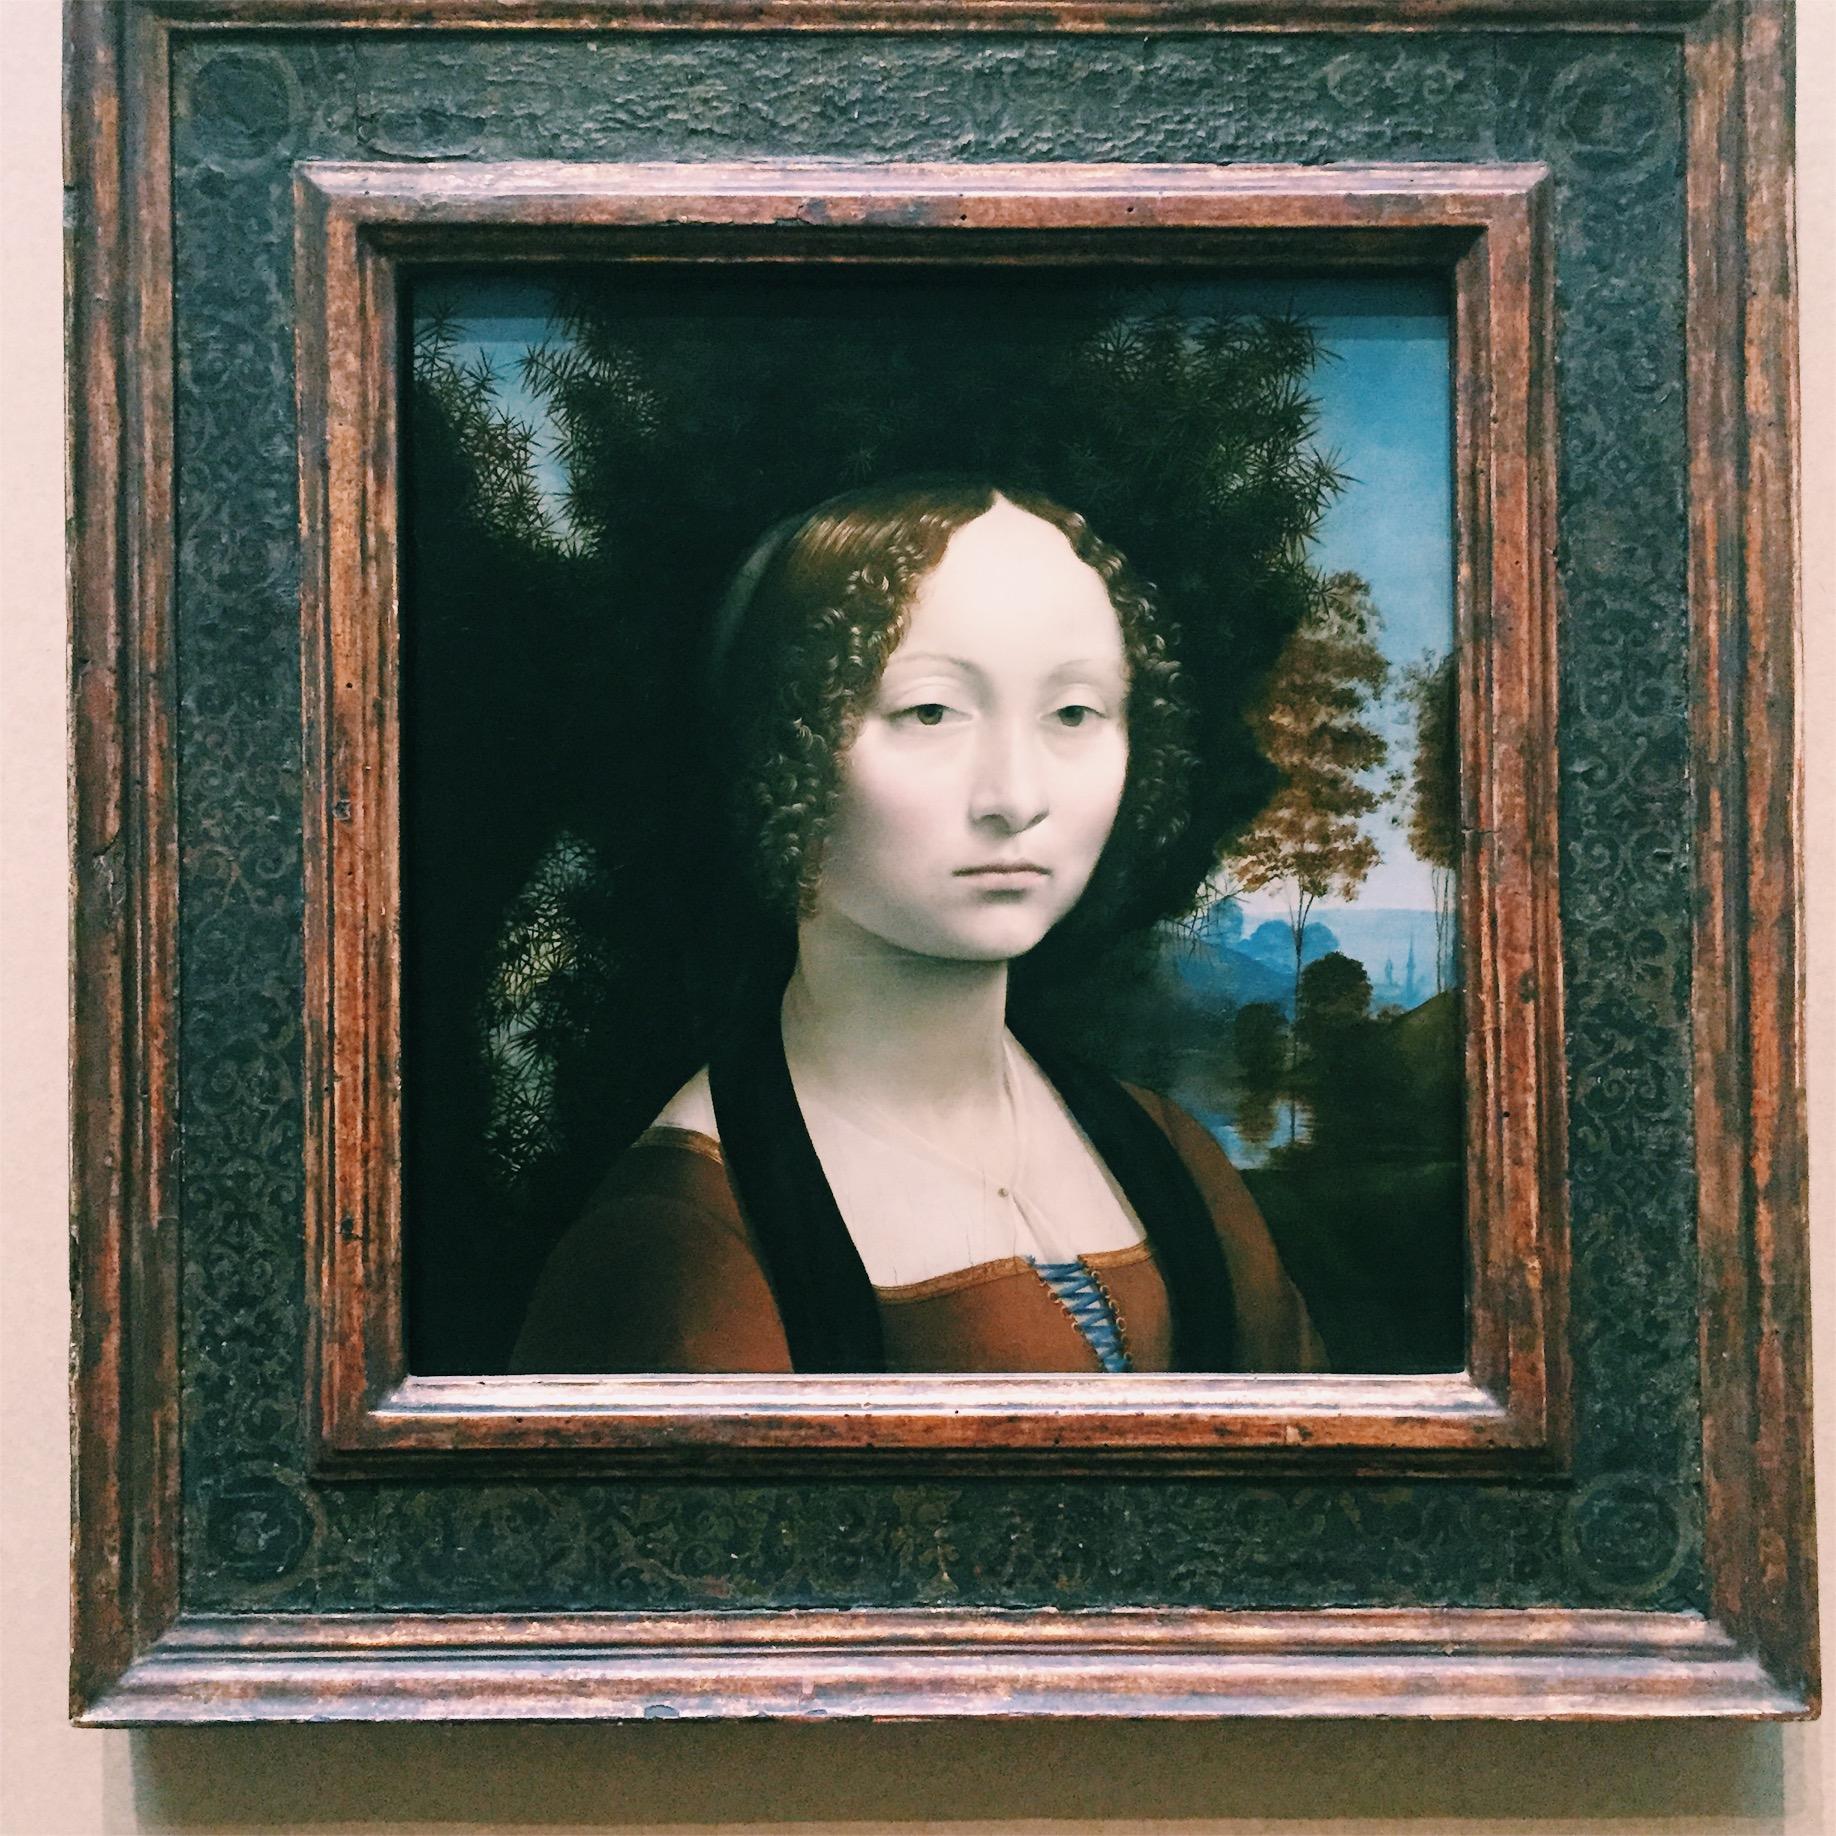 Ginevra de Benci by Leonardo da' Vinci. This portrait lives in the National Gallery in Washington, D.C.